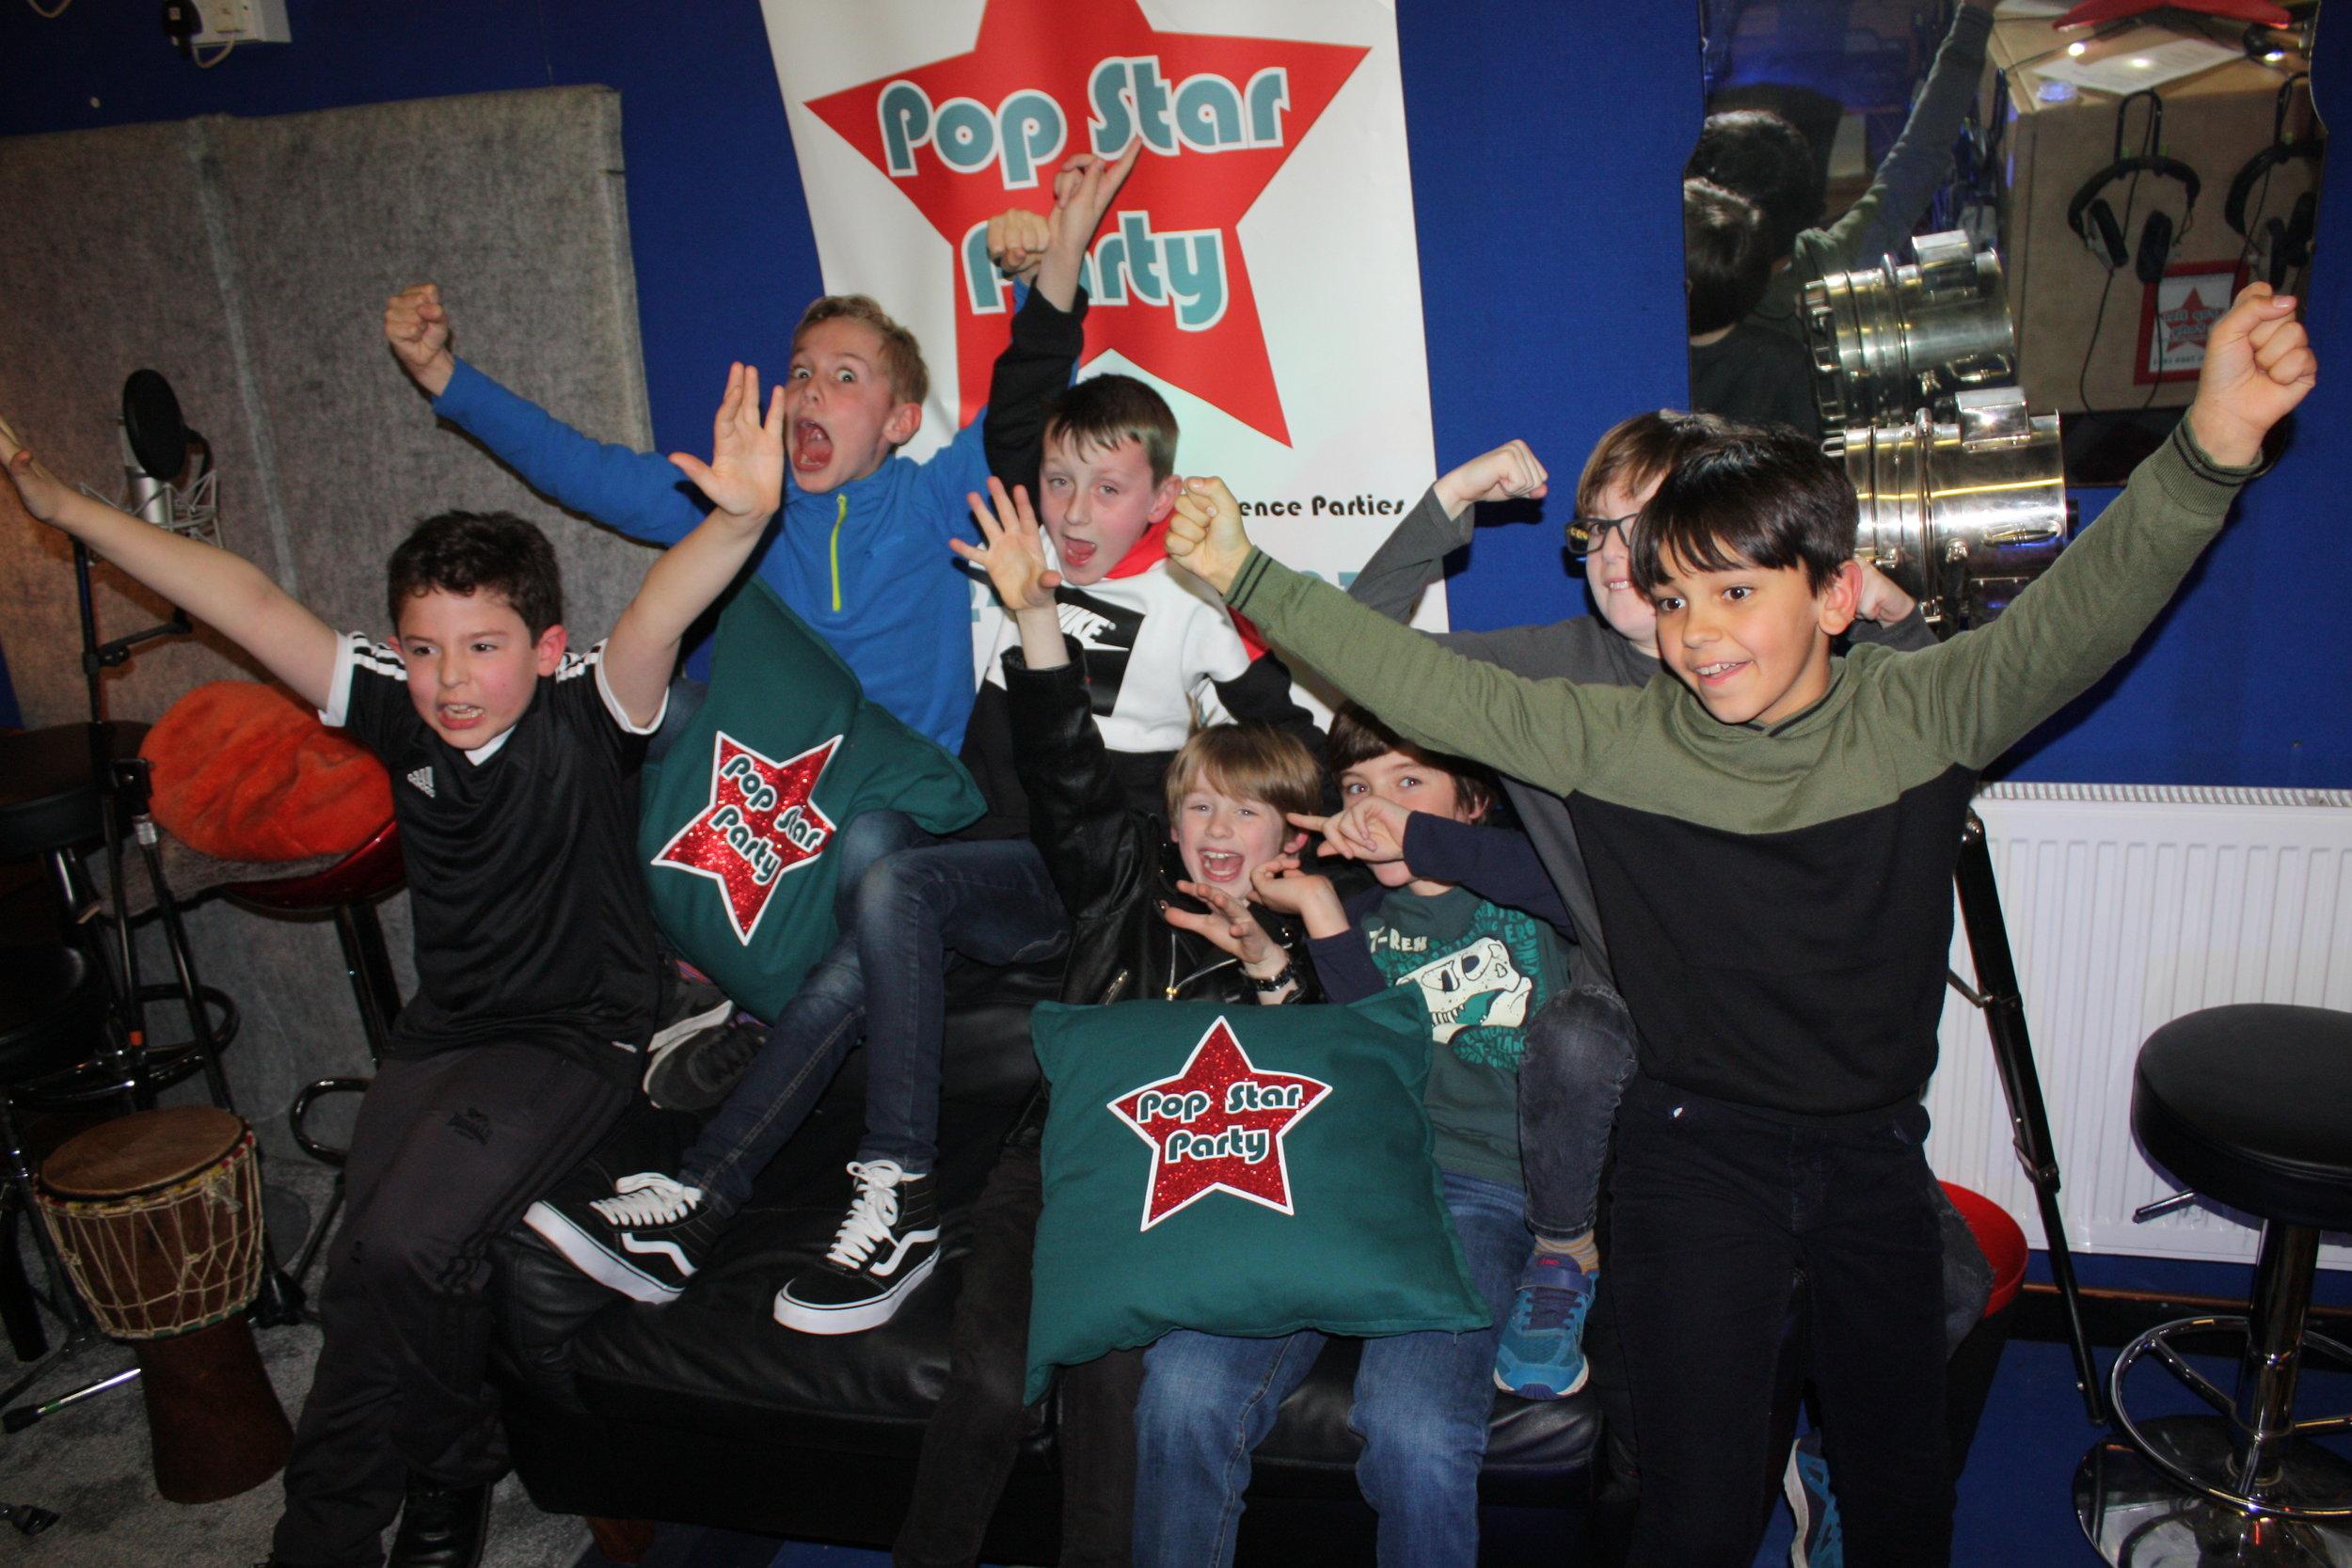 Pop Star Party - Boys.jpg